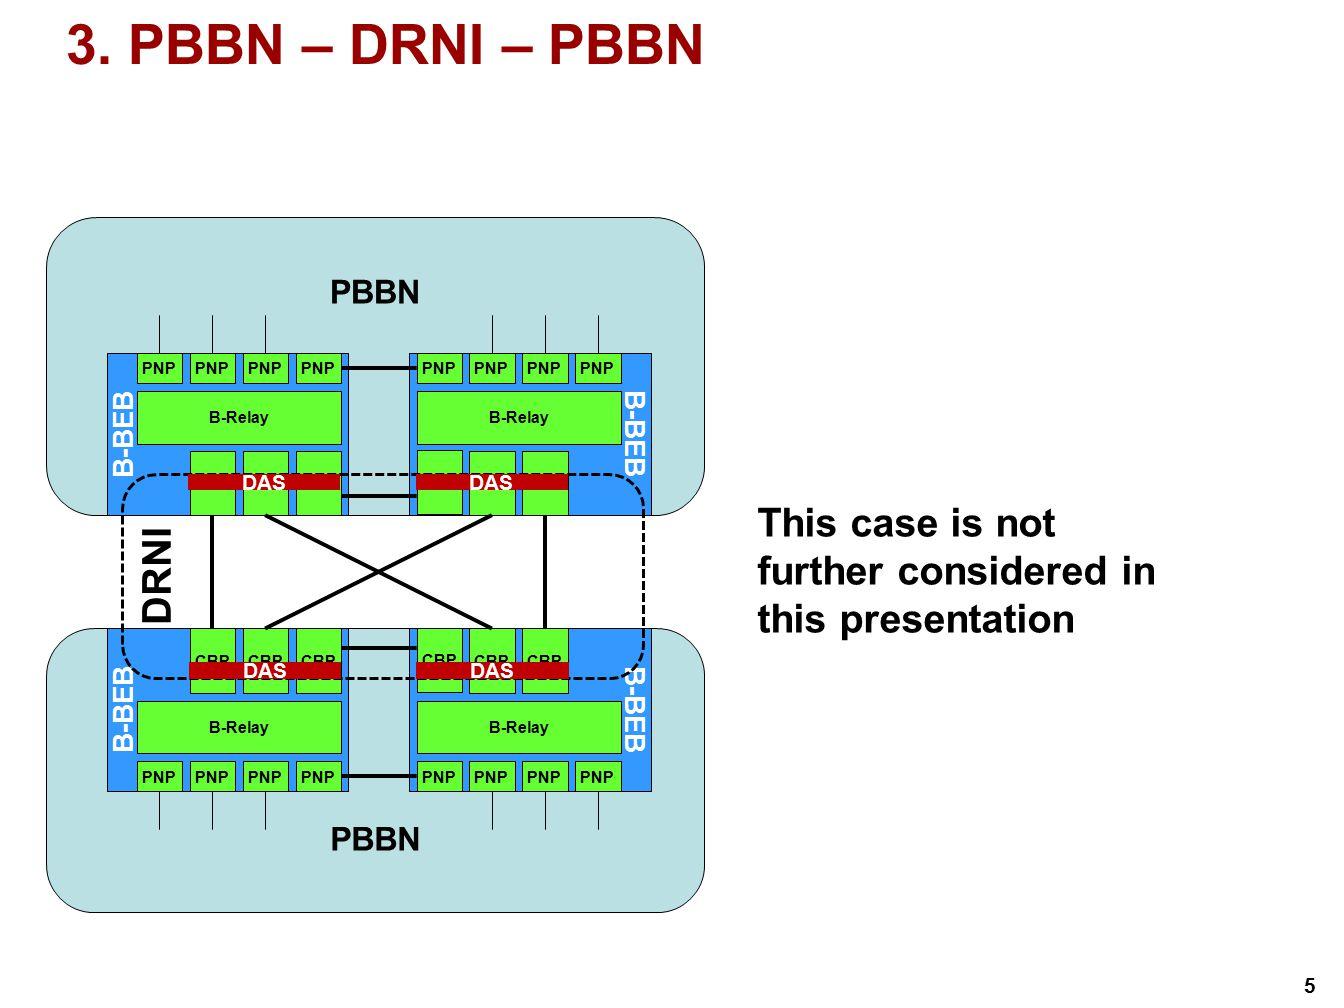 5 PBBN B-BEB B-Relay PNP B-BEB B-Relay PNP PBBN B-BEB 3. PBBN – DRNI – PBBN CBP B-Relay PNP B-BEB CBP B-Relay PNP CBP DRNI DAS This case is not furthe